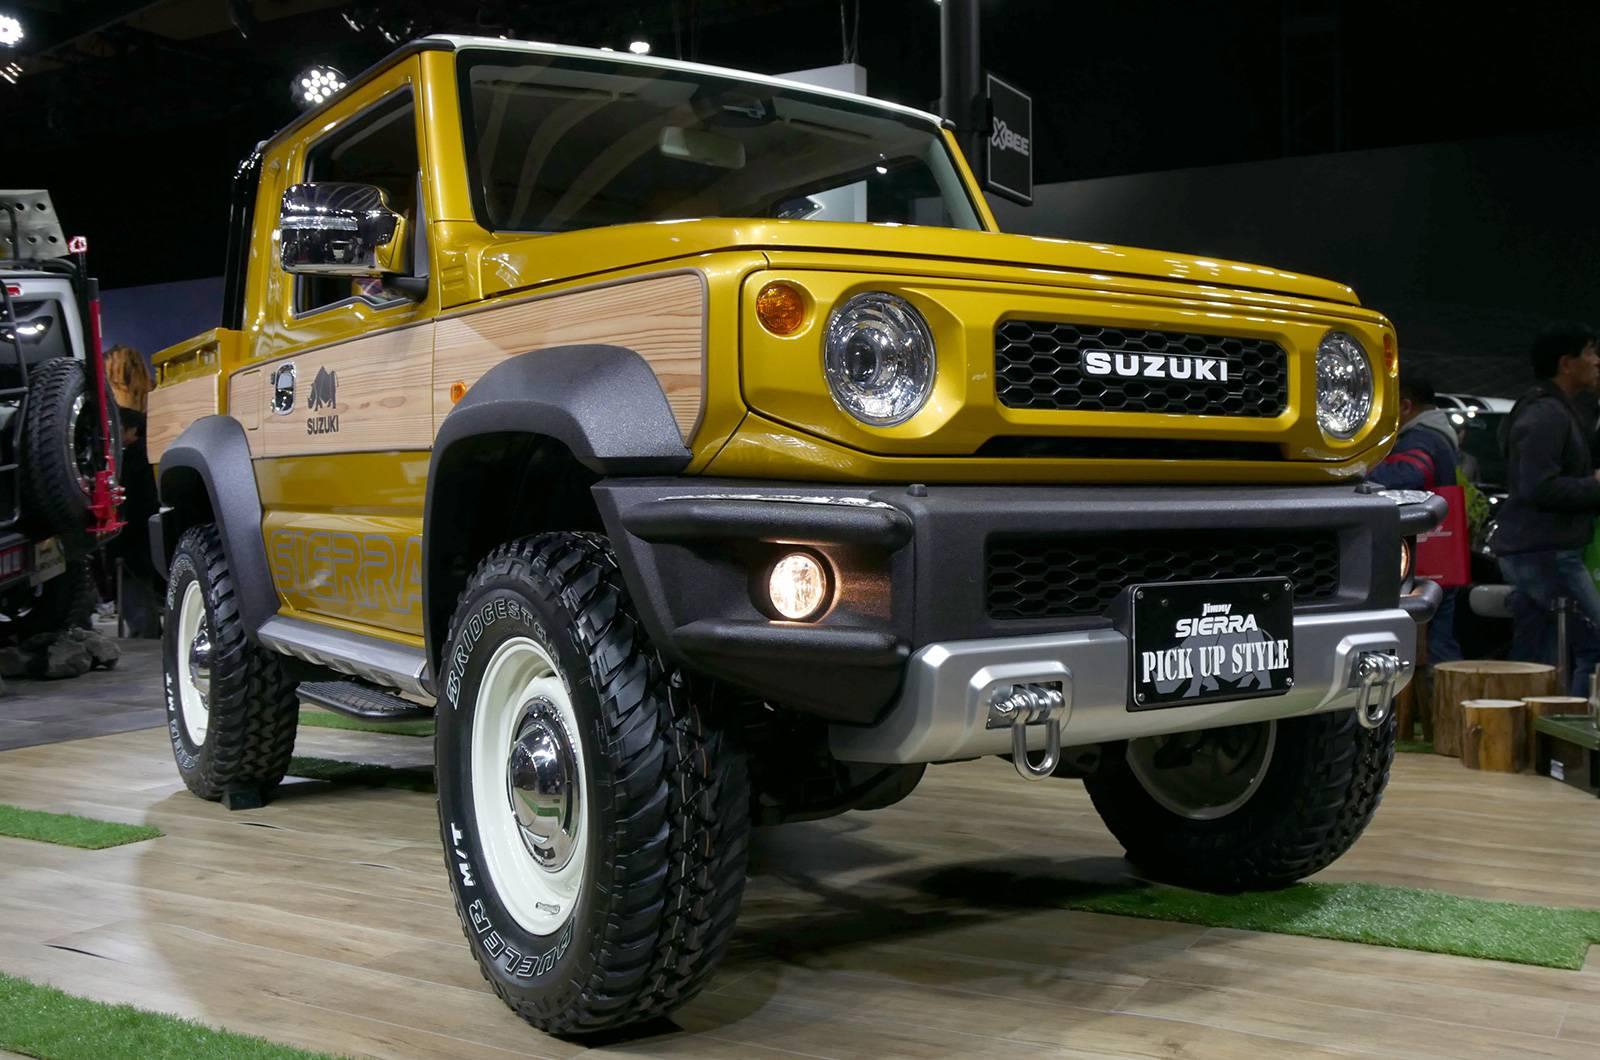 Suzuki Jimny Sierra Pickup Style concept andJimny Survive concept (2)